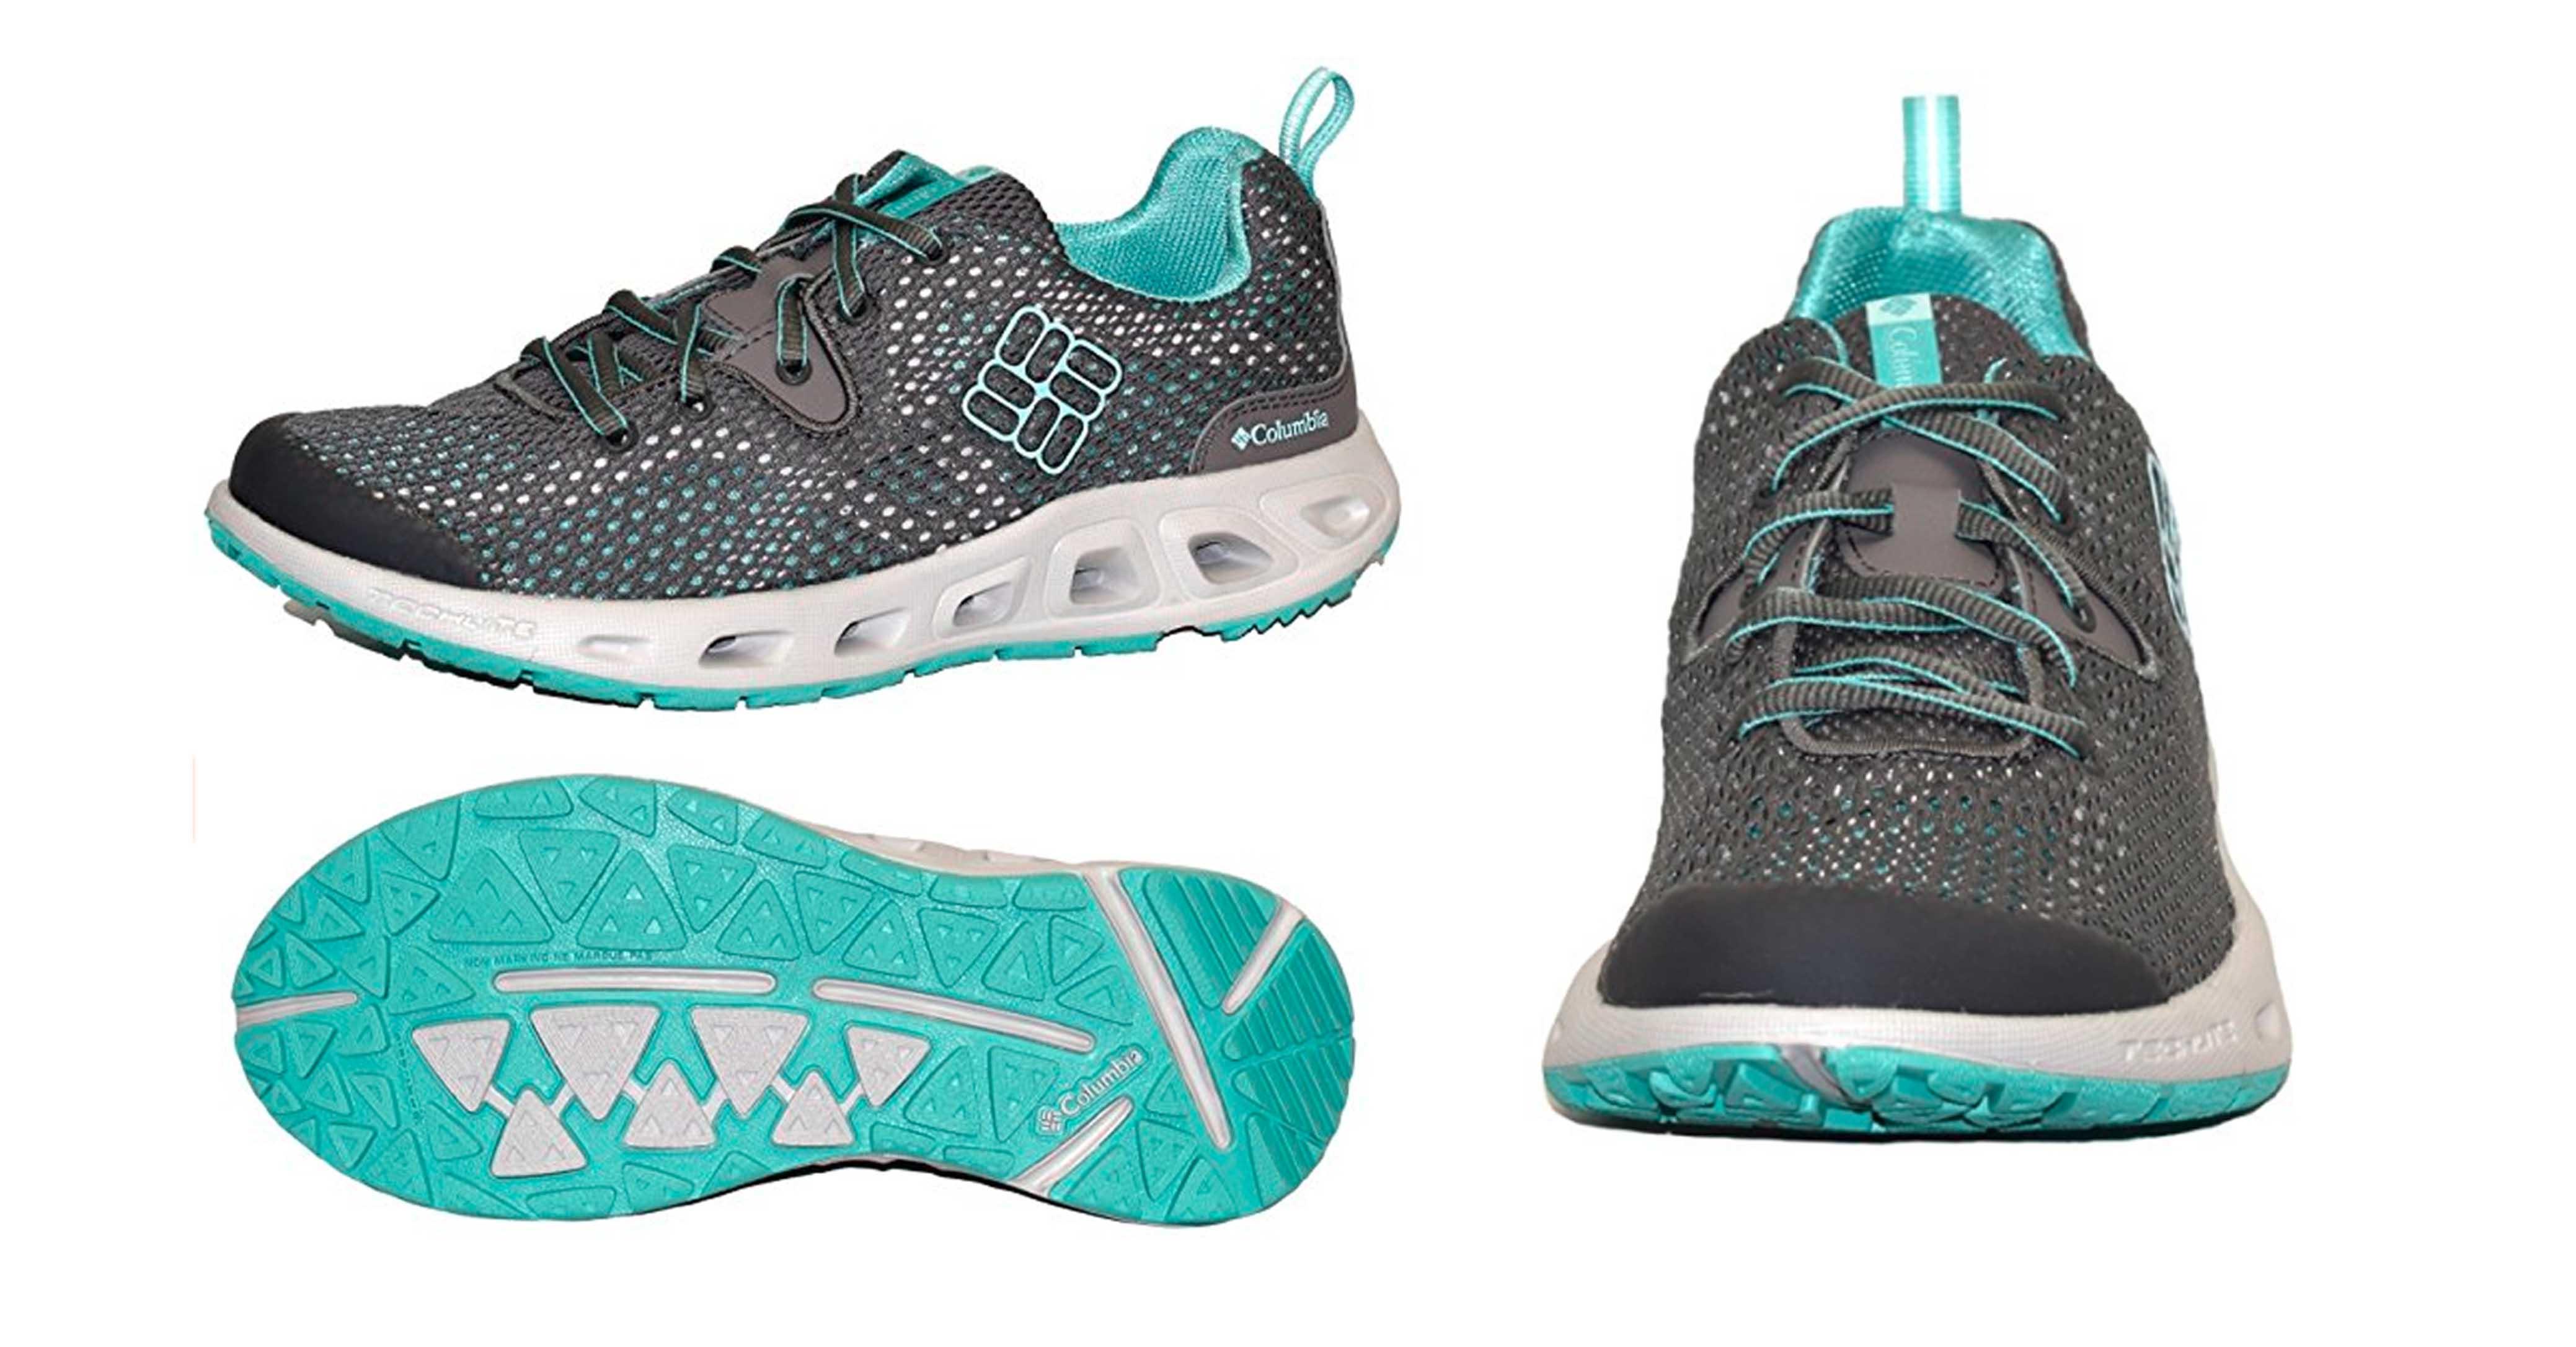 Columbia Women's Drainmaker II Water Shoe